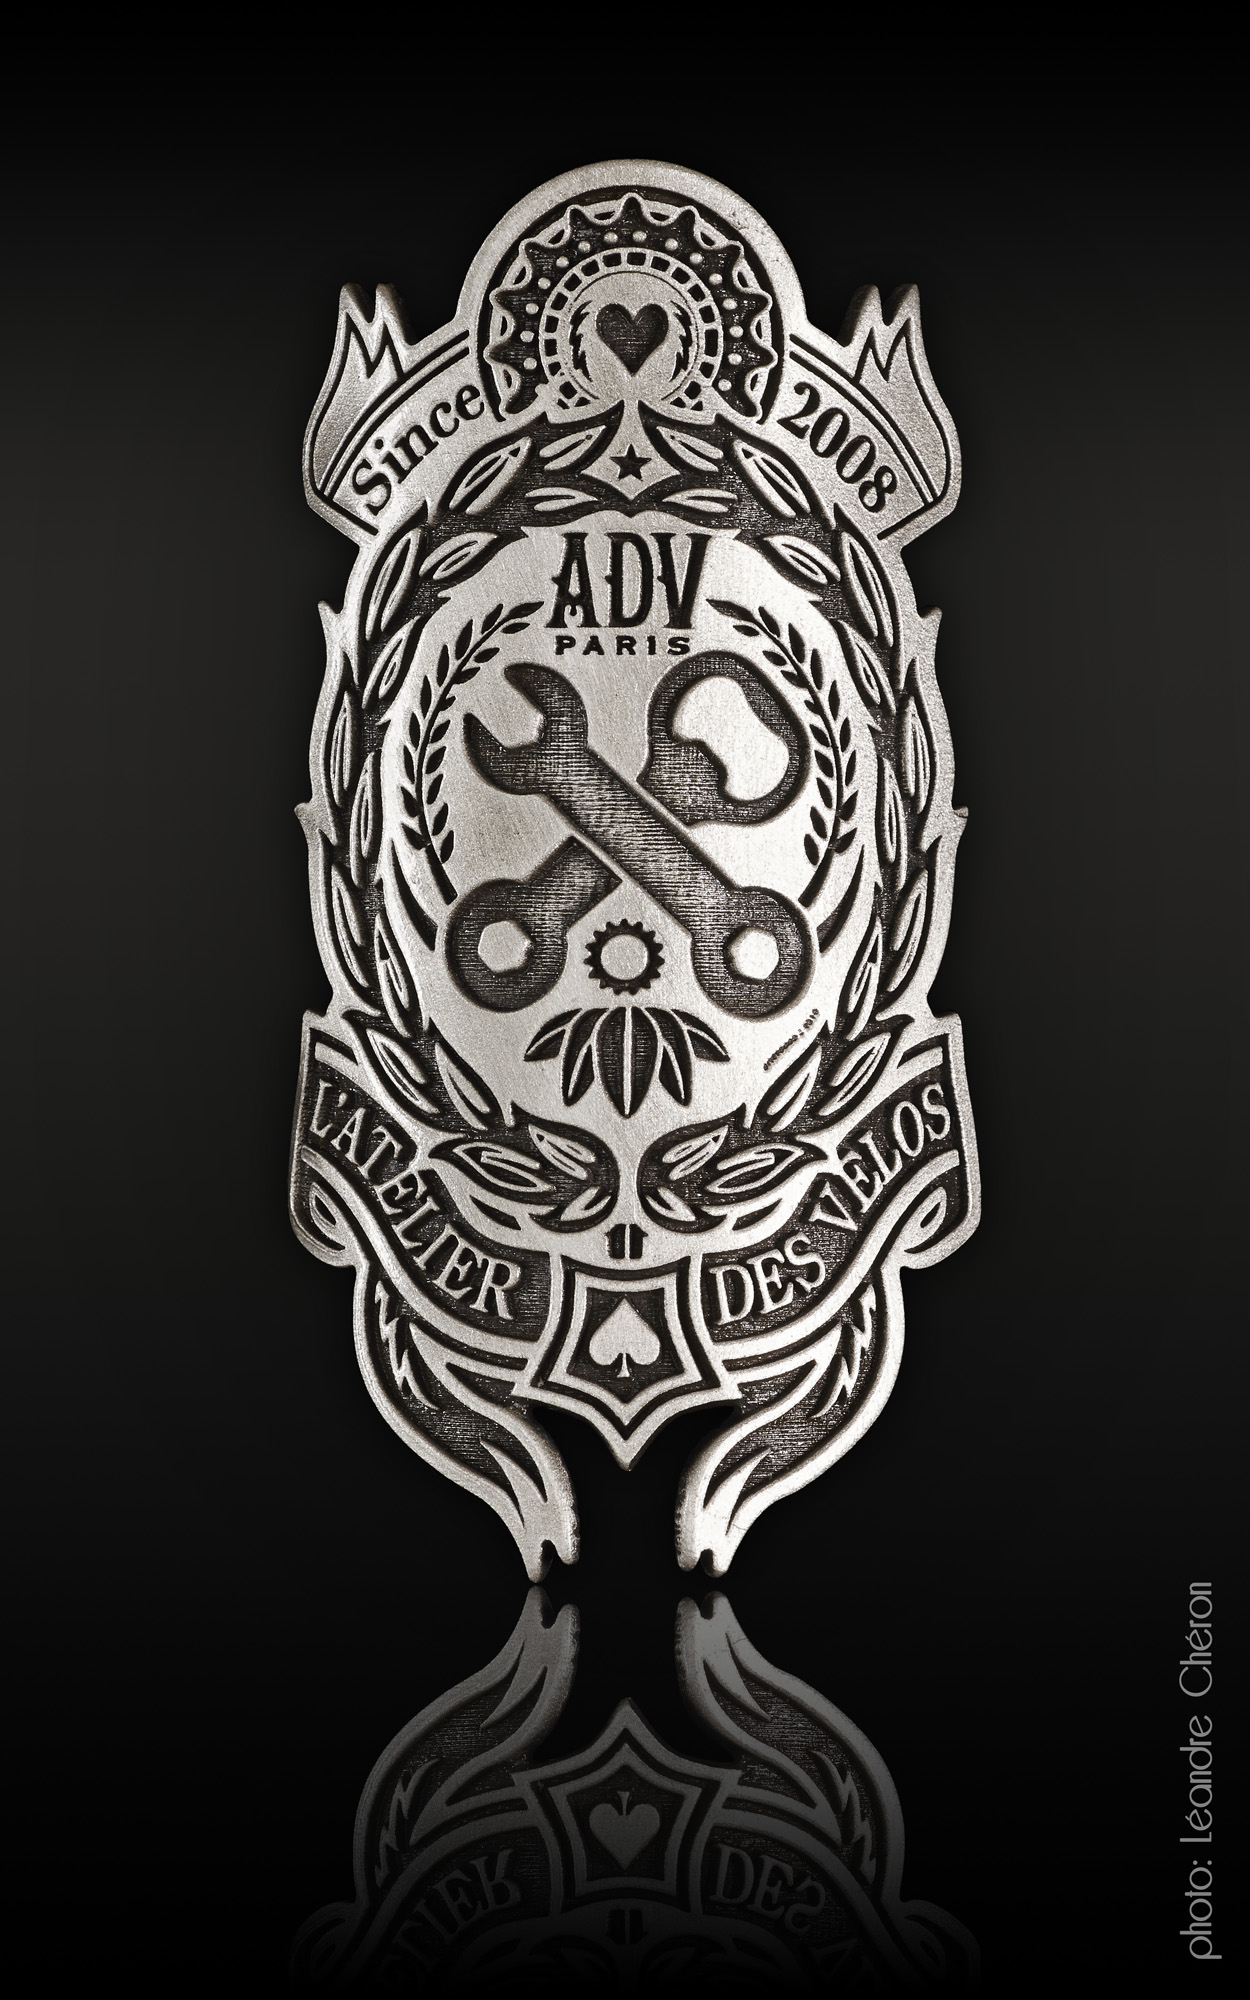 Head Badge ADV